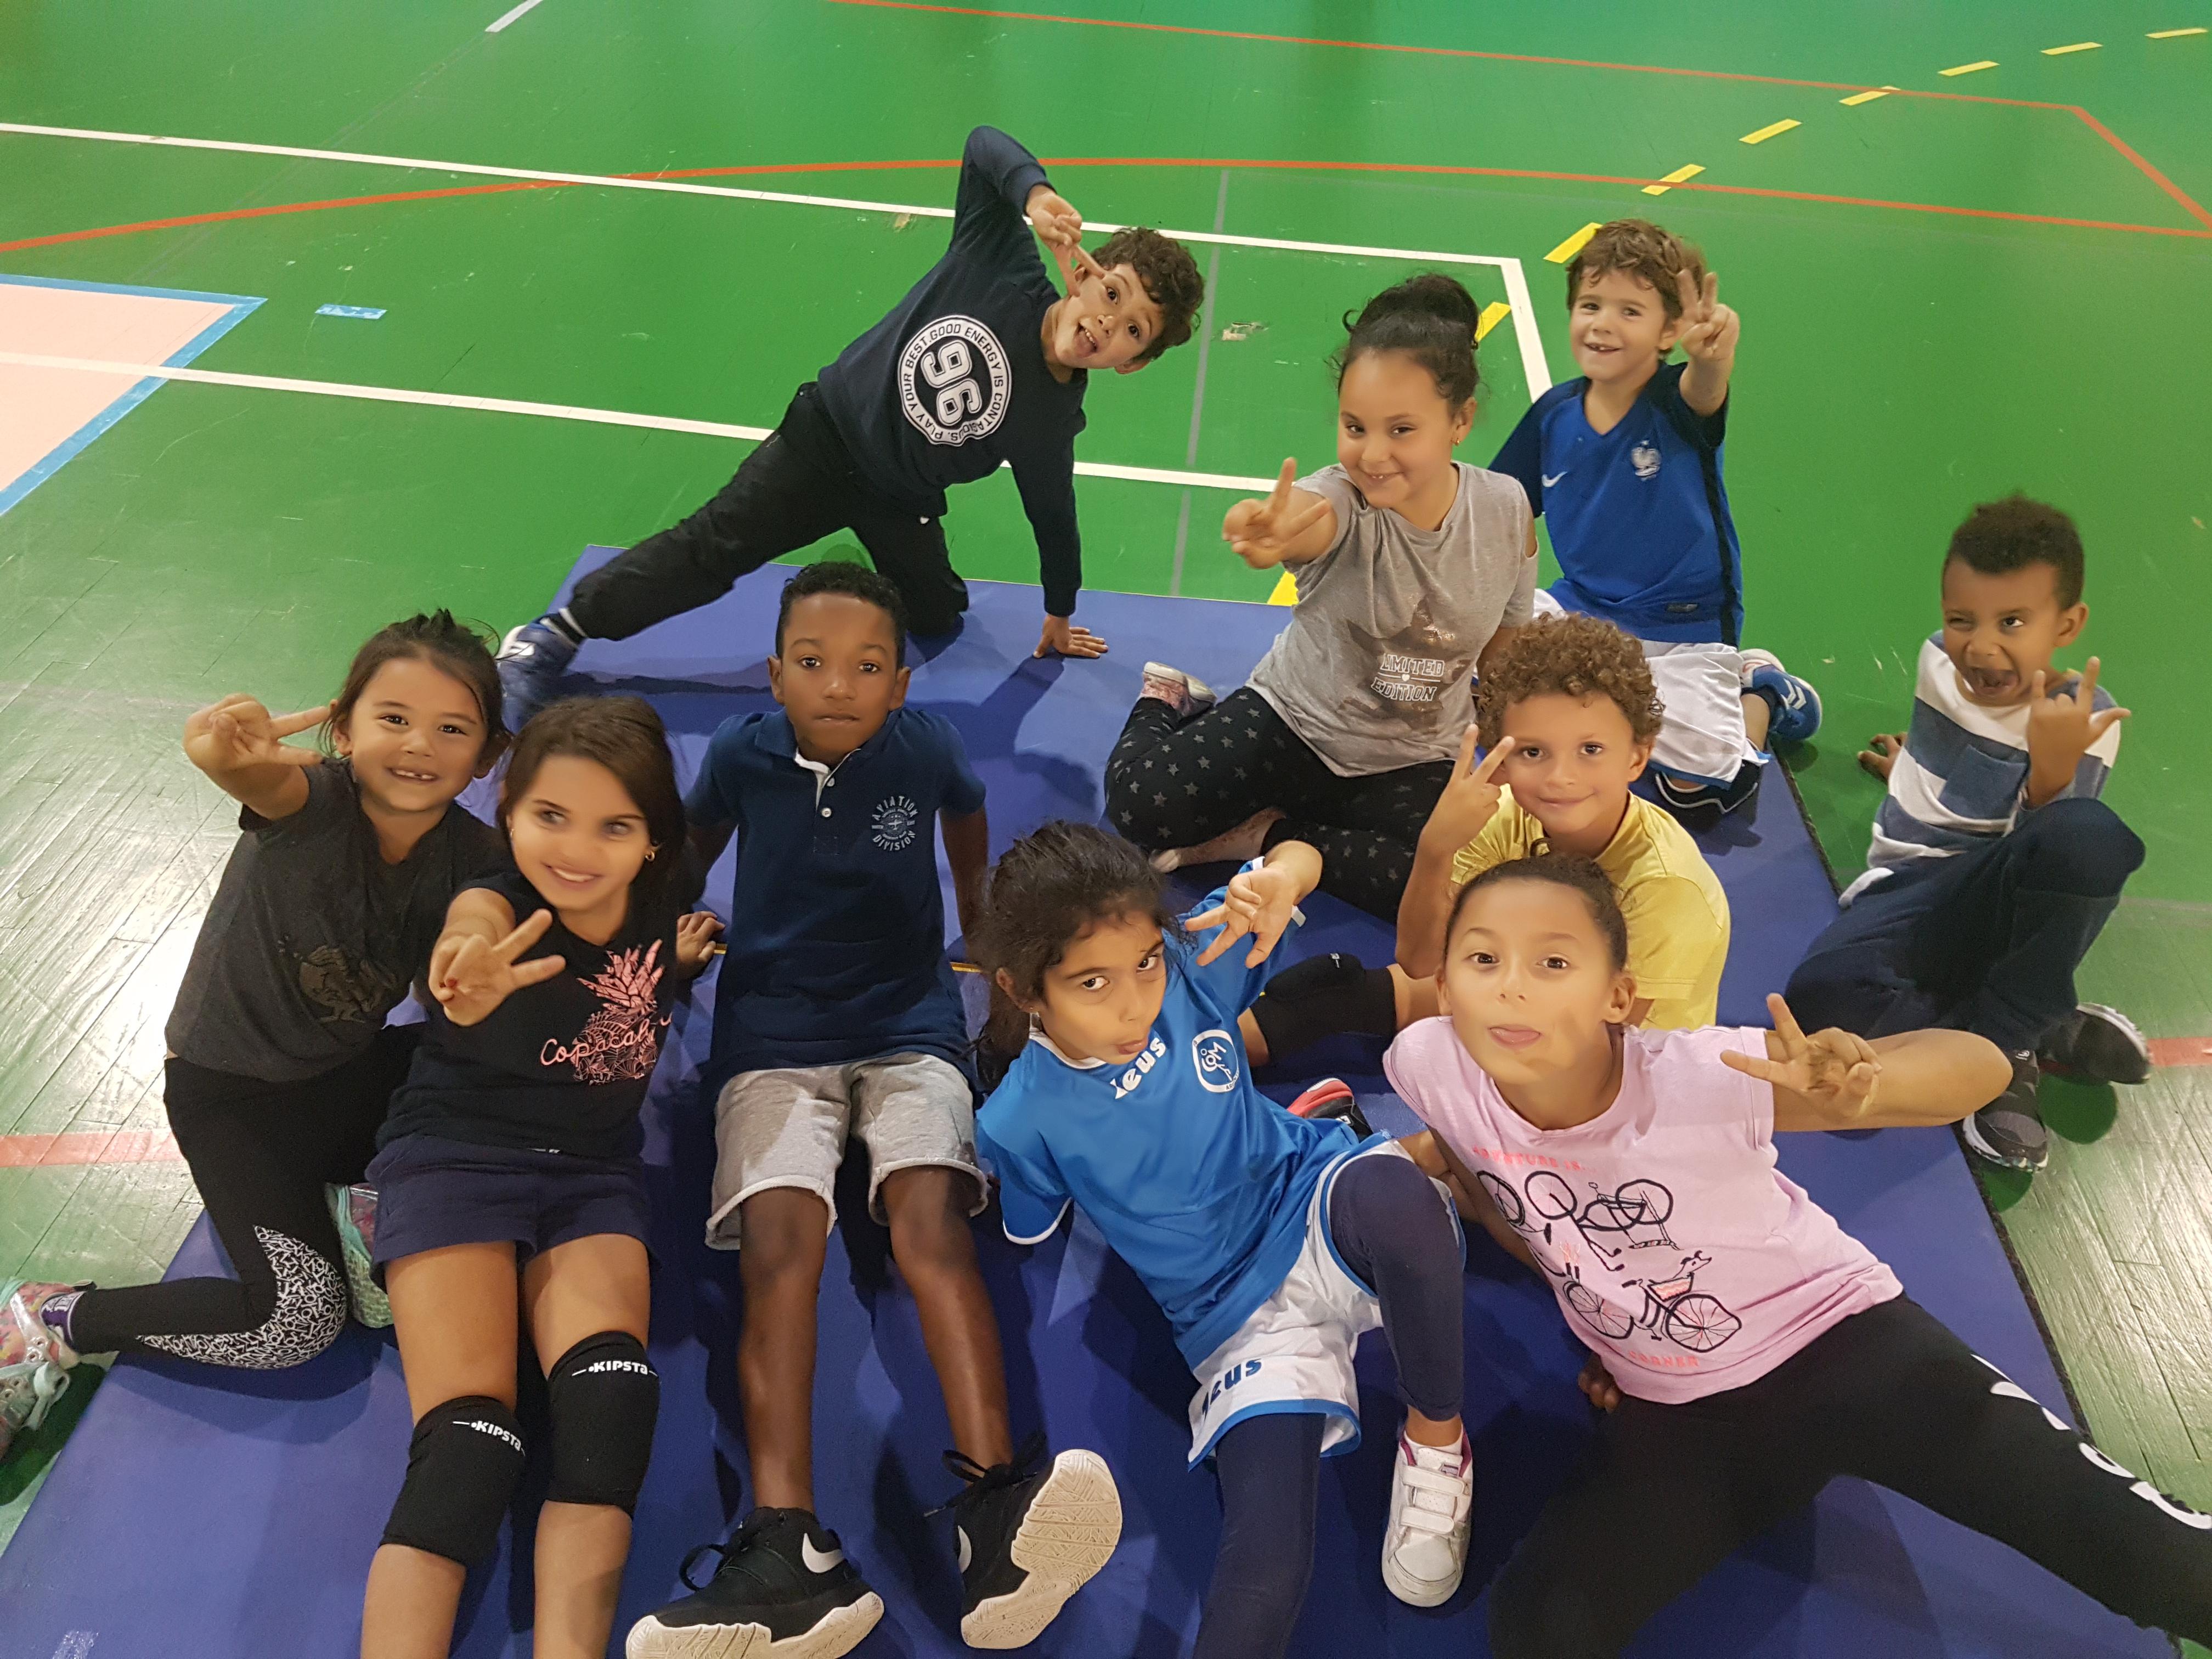 Volley ball enfant